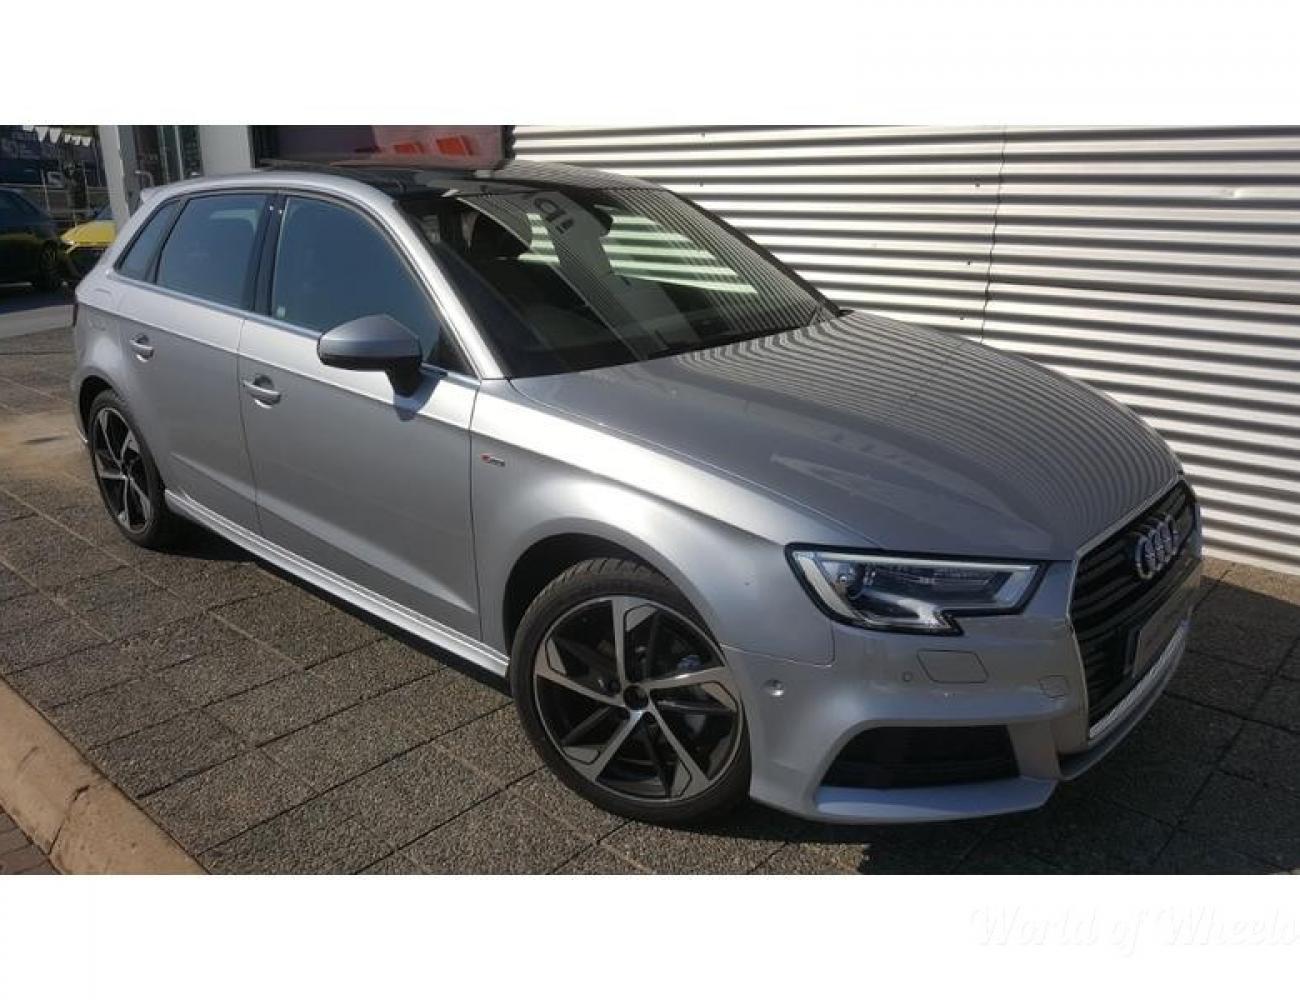 2020 Audi A3 Sportback 1.4TFSI Auto For Sale